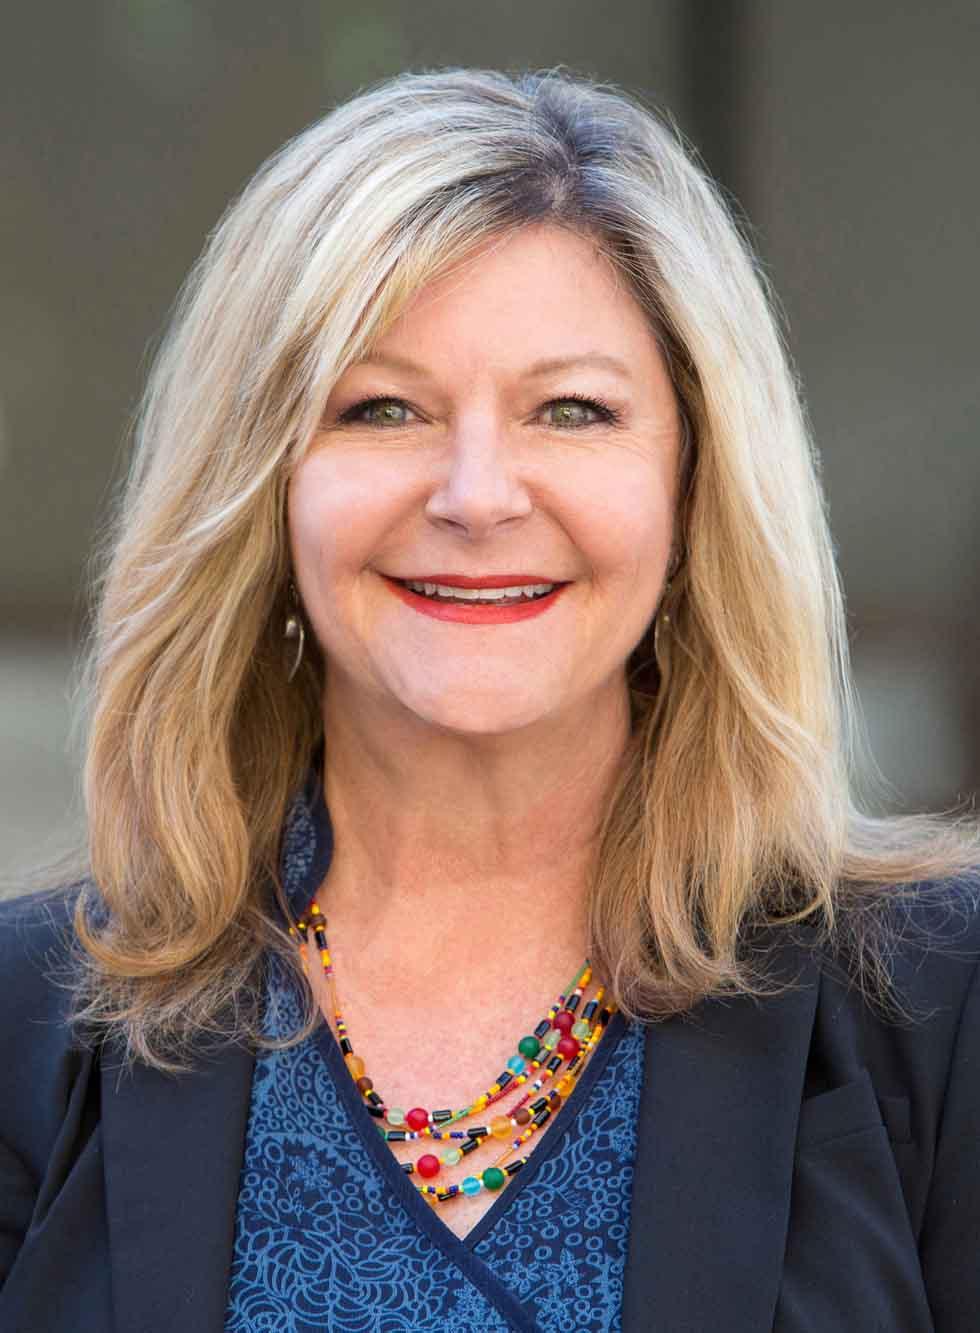 Jill Baradat   Director, Insurance Division and Project Marketing